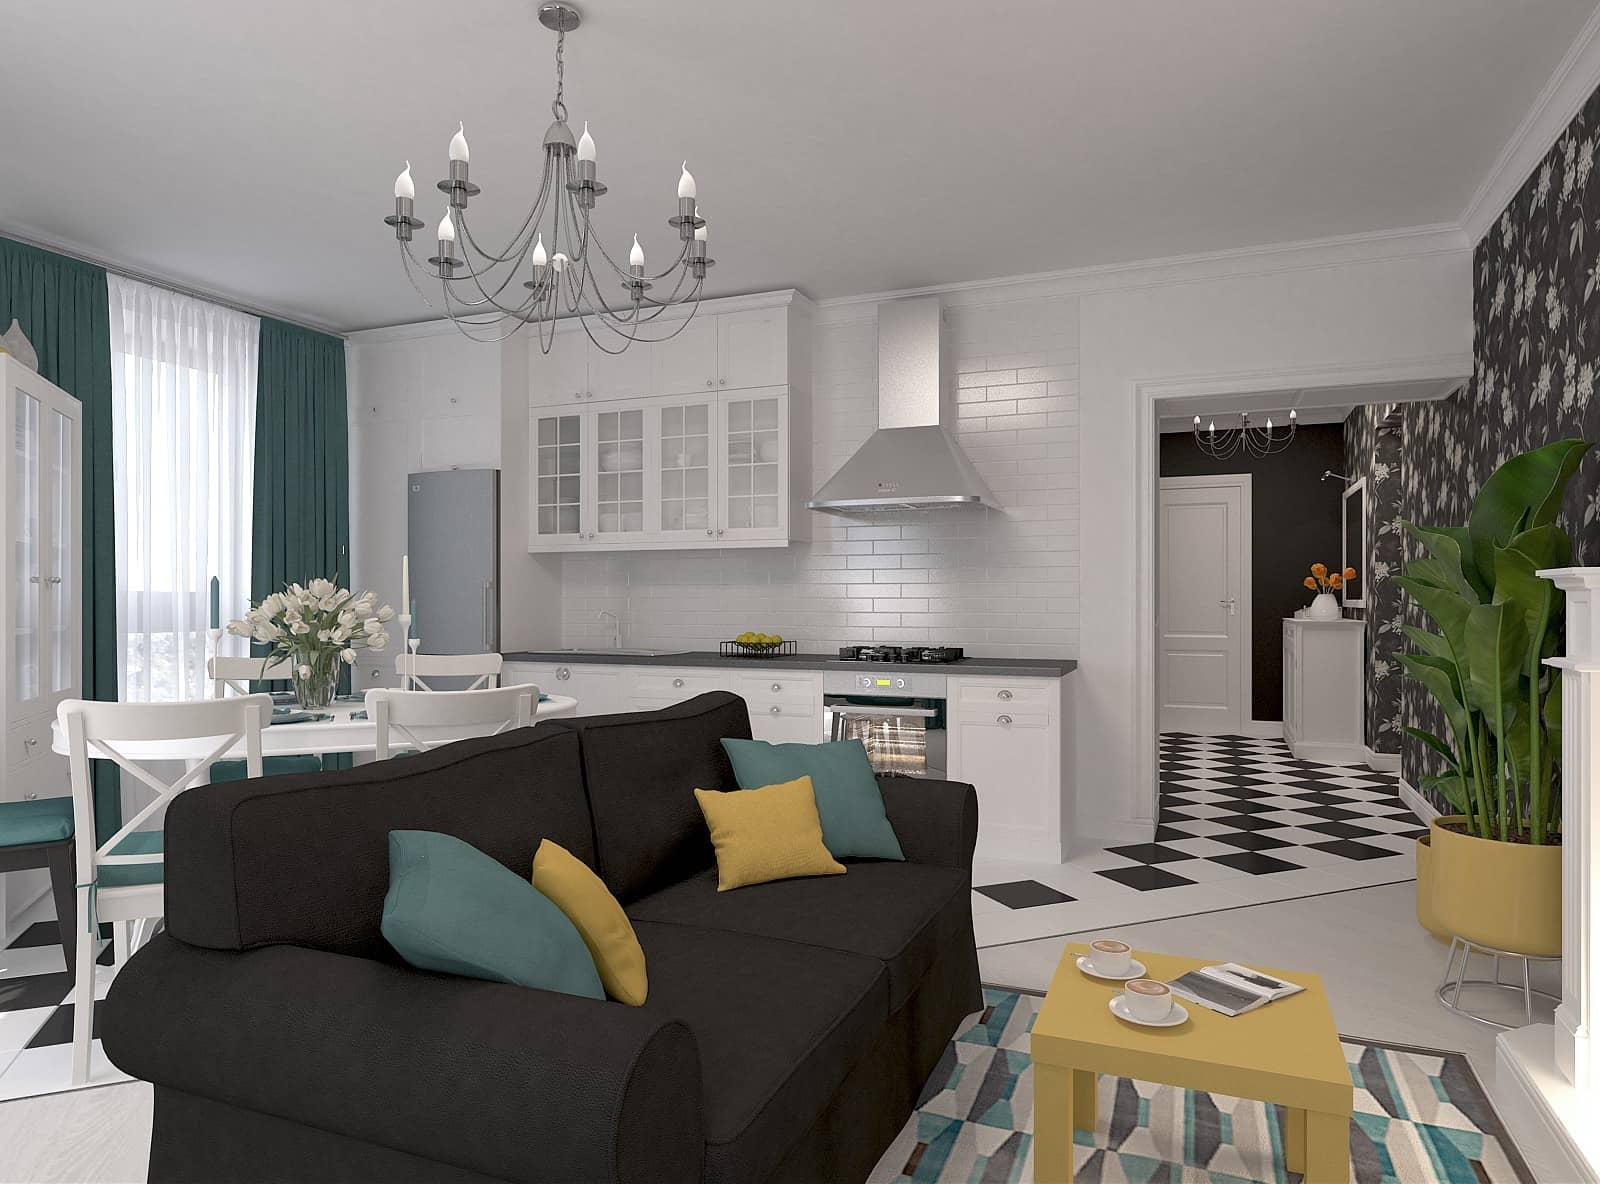 Дизайн квартири-студії: фото 2.1